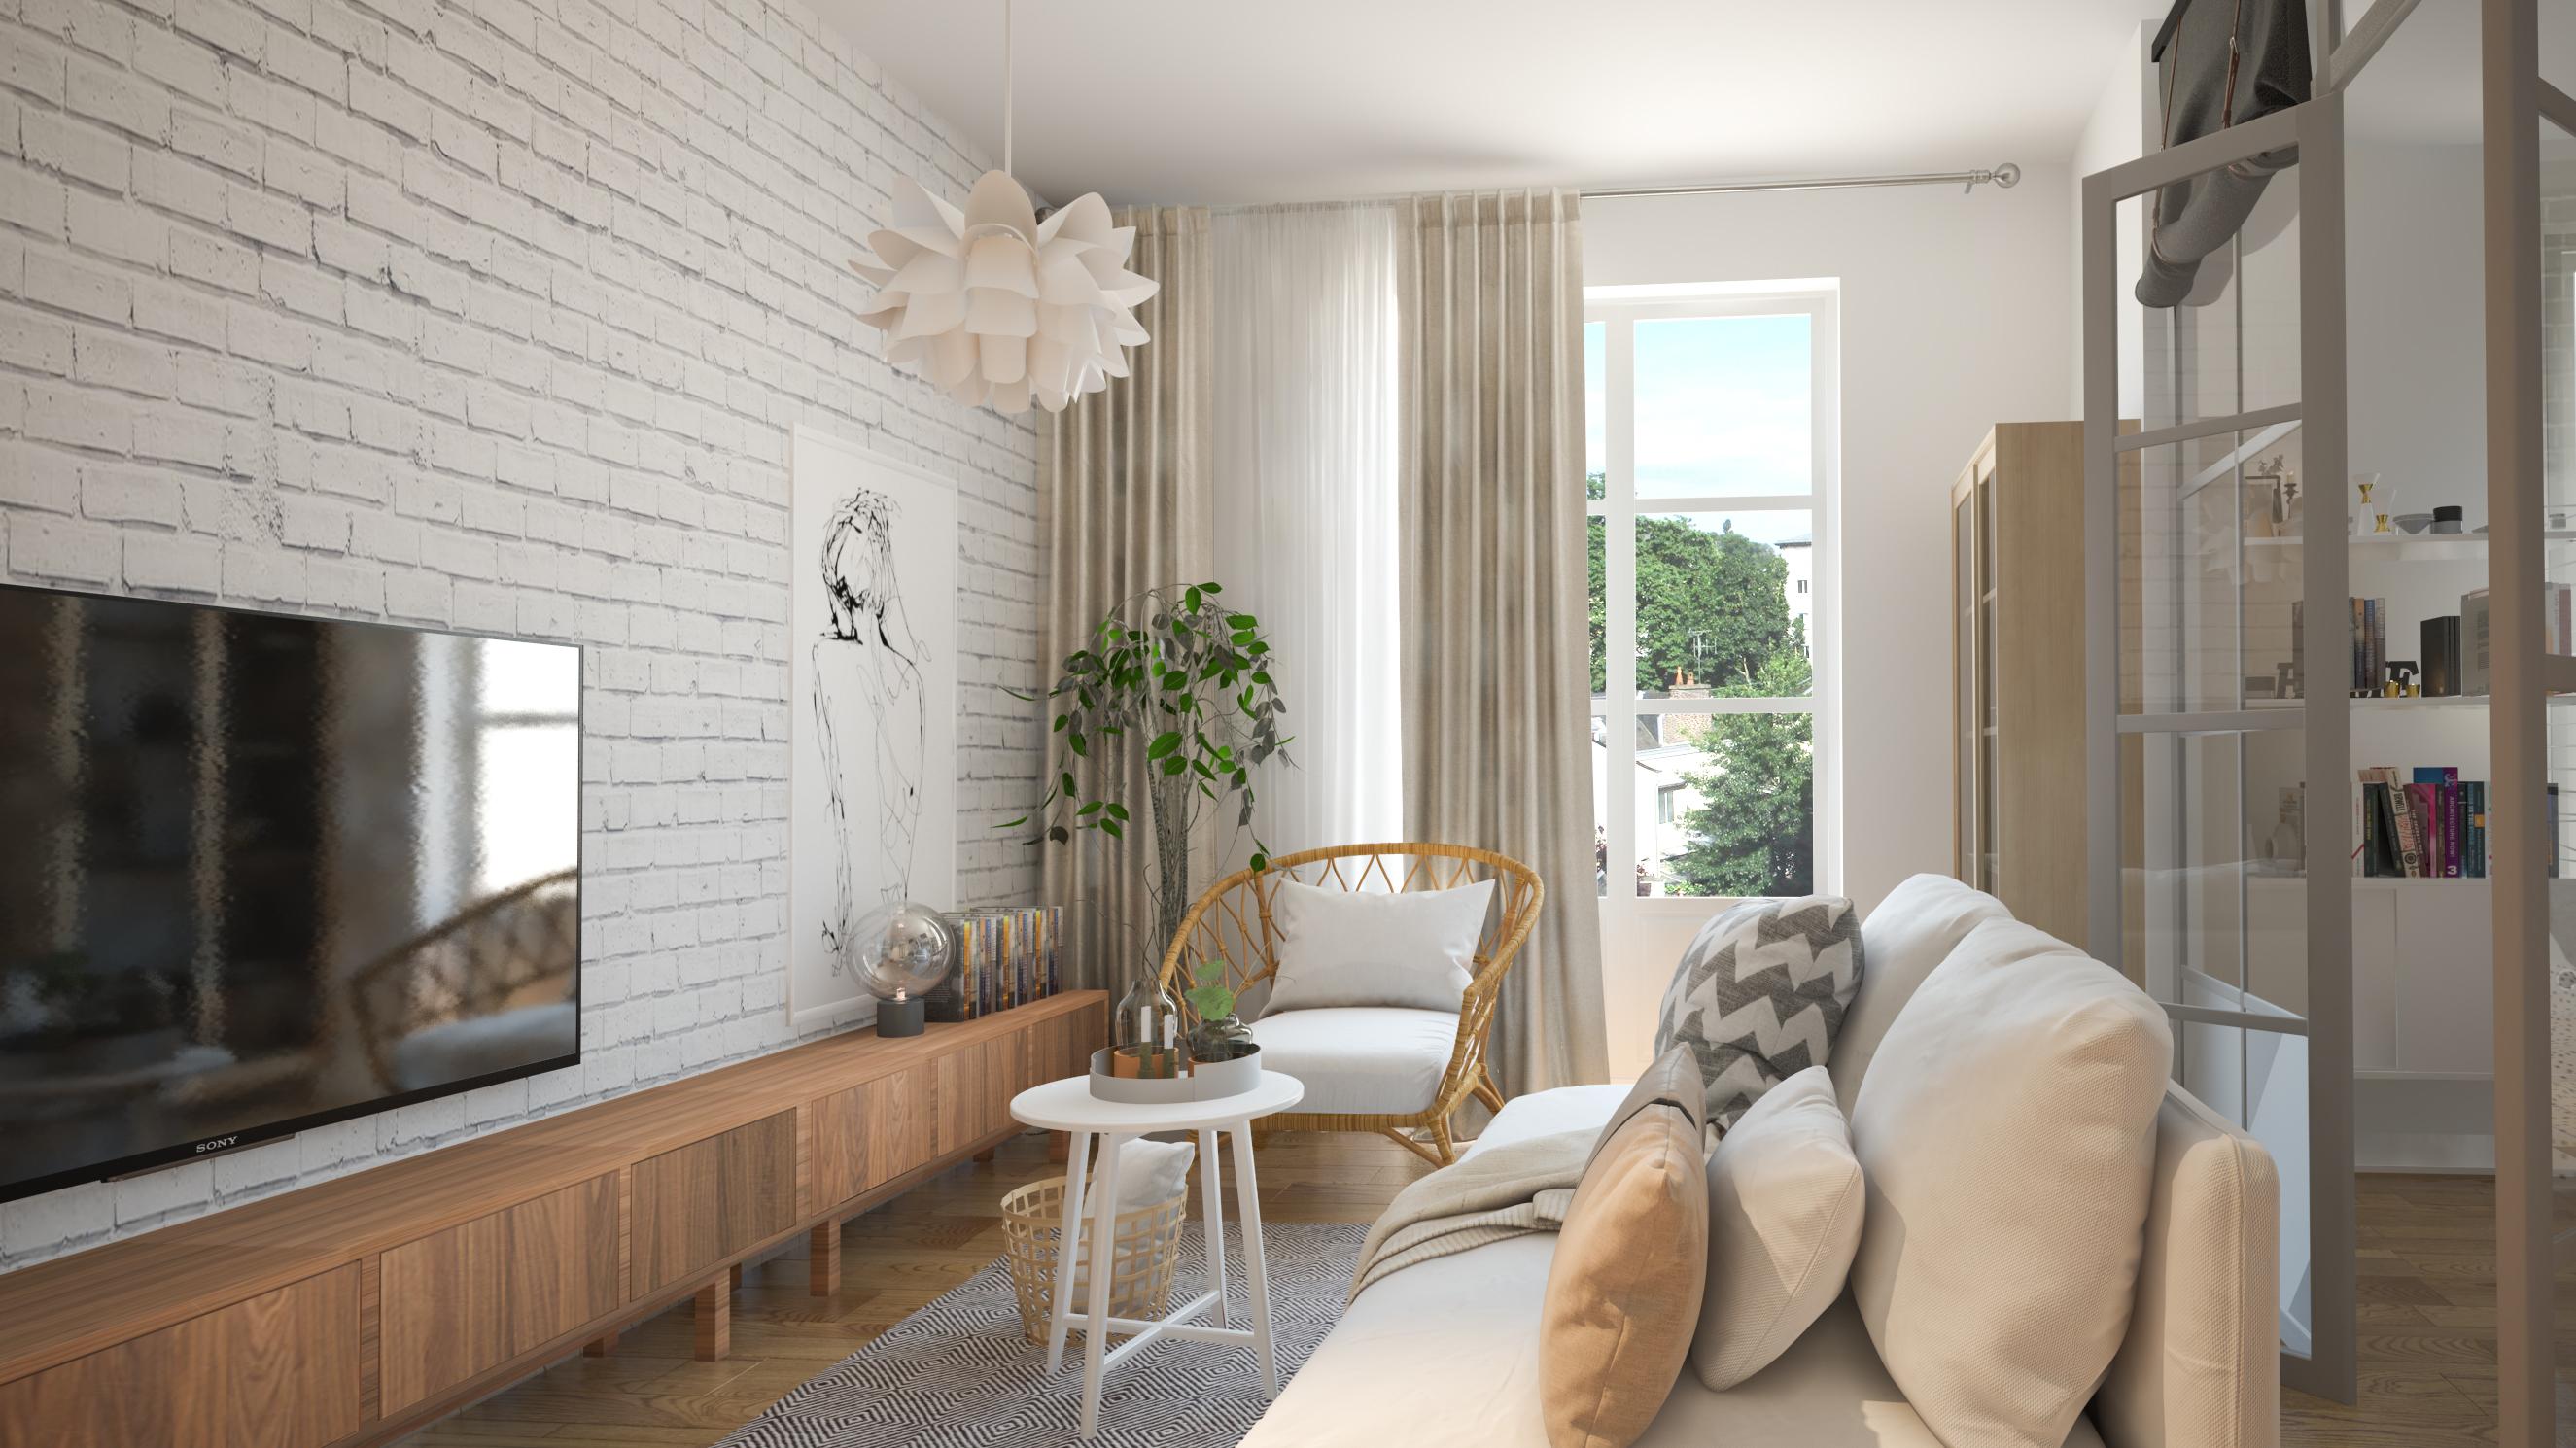 amenajare interioara accente caramida. Black Bedroom Furniture Sets. Home Design Ideas